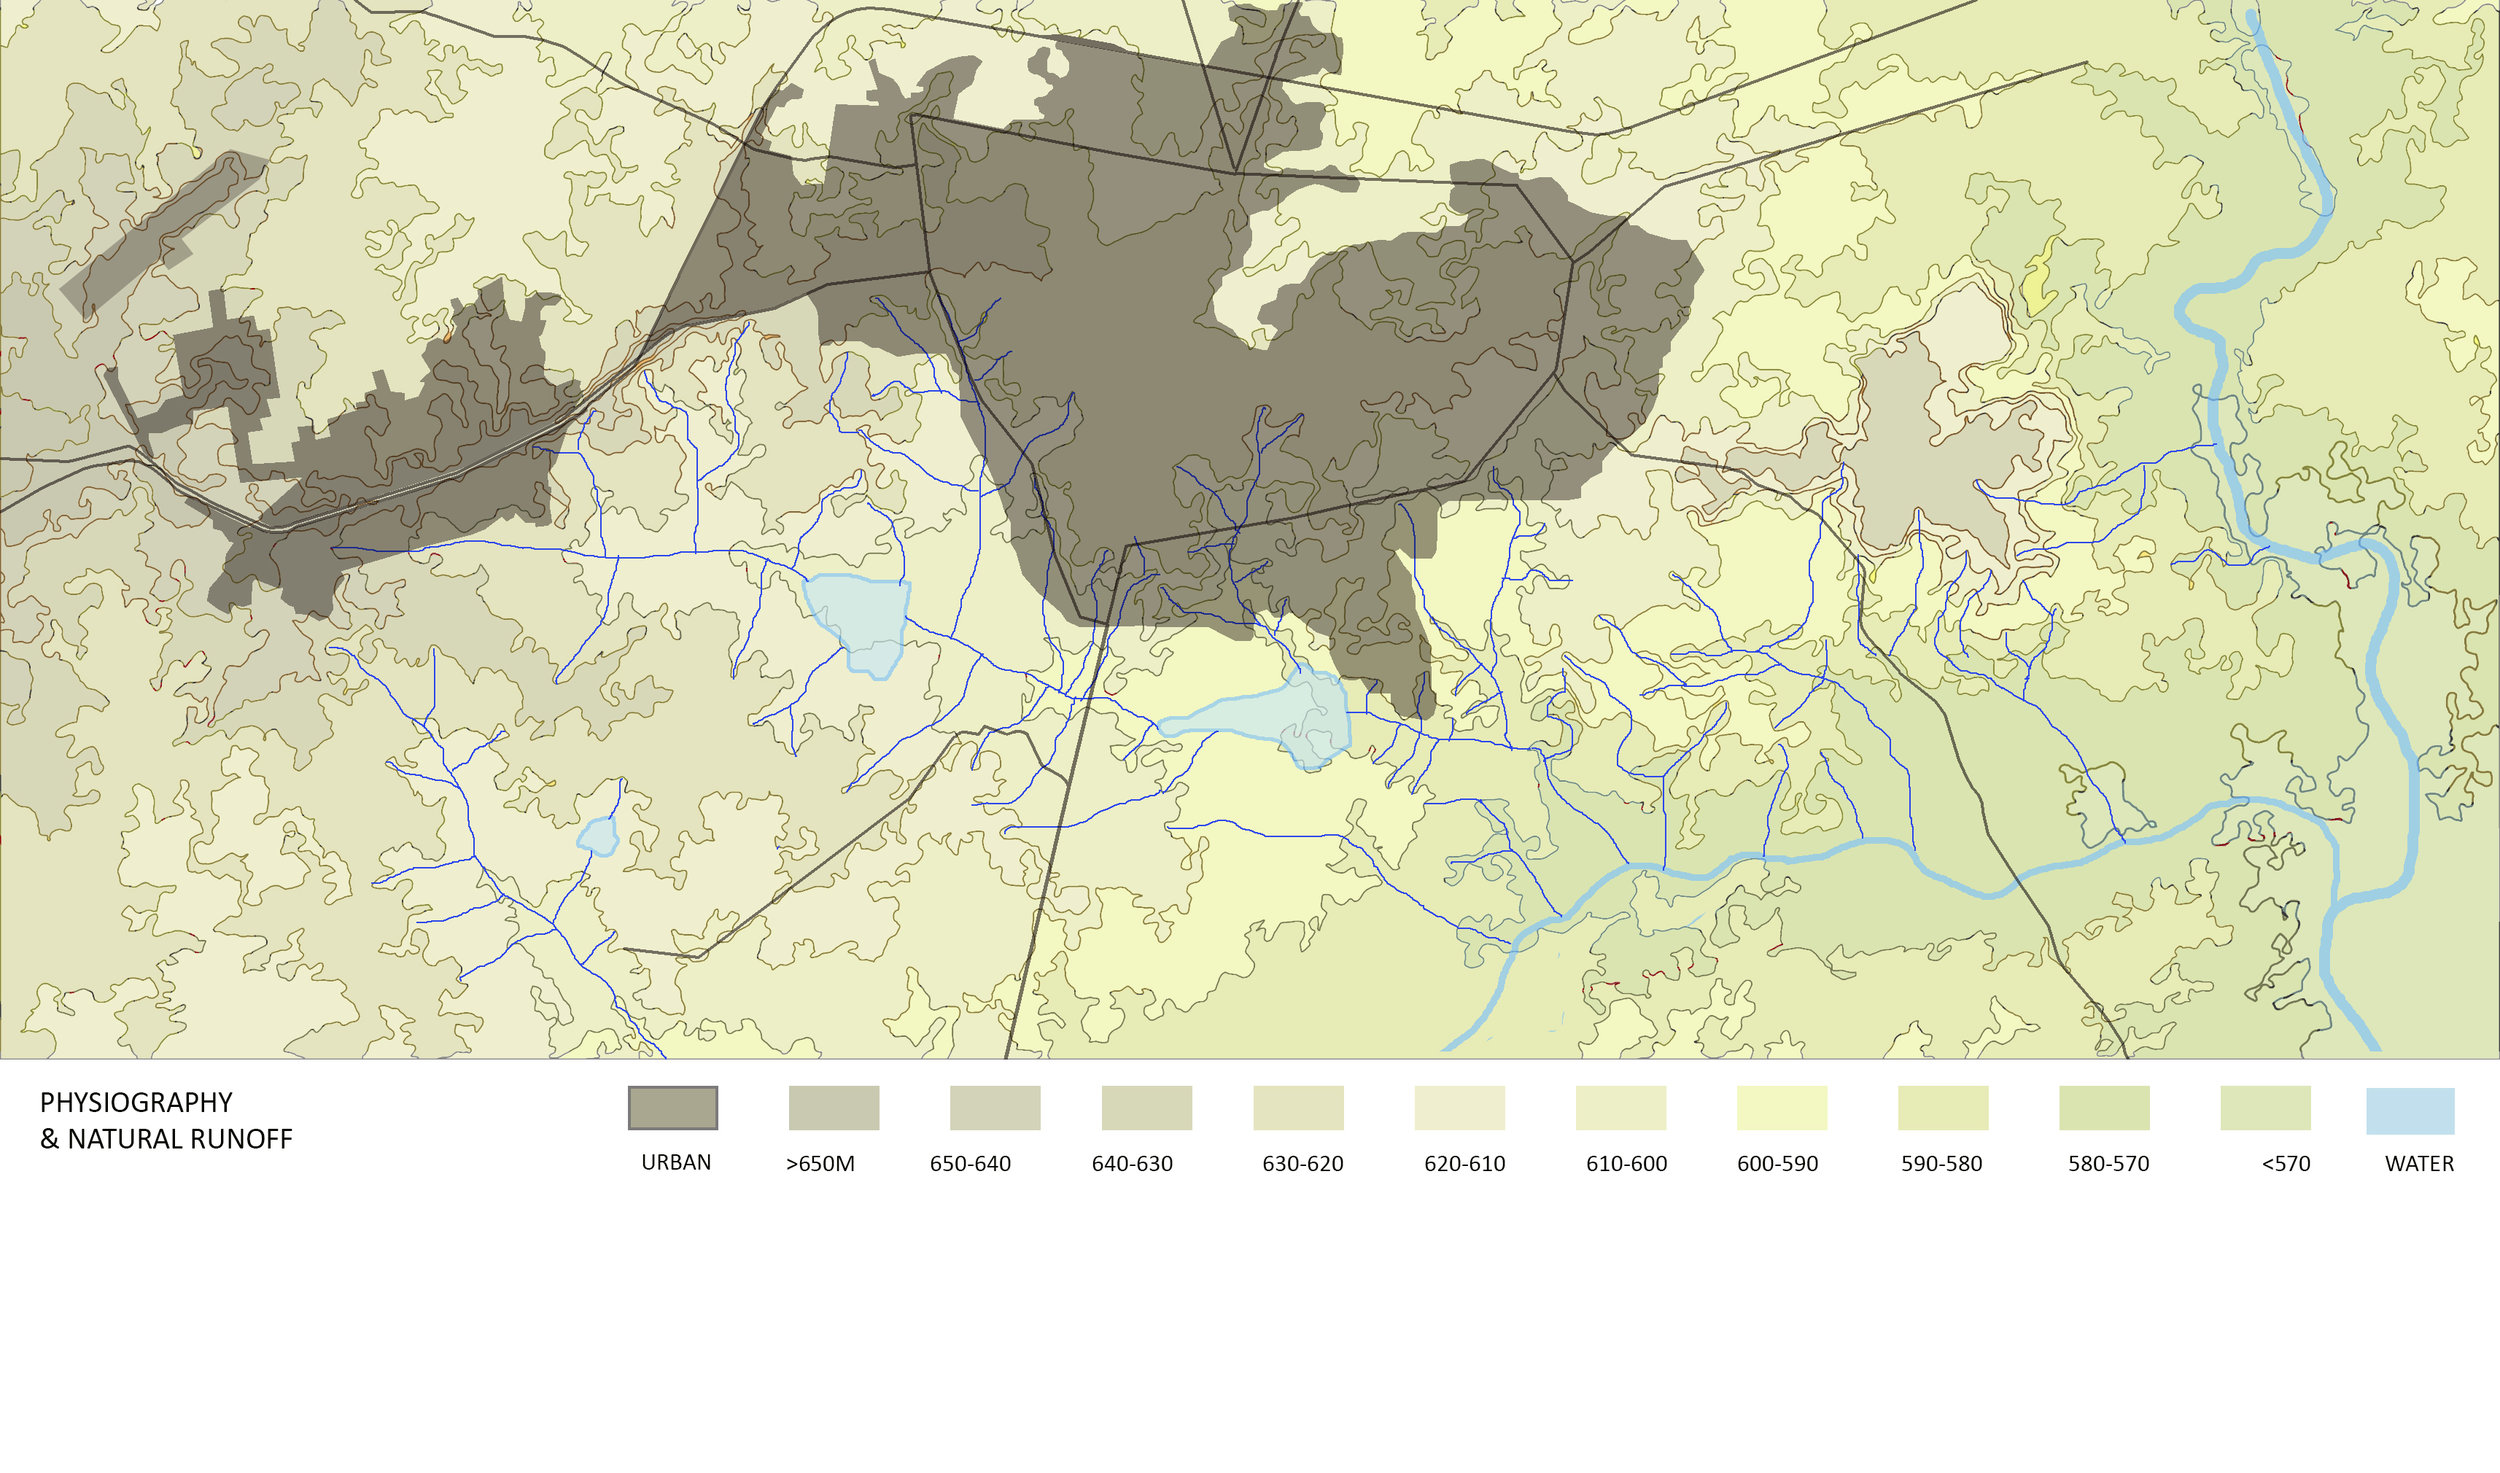 Ficus-landscape-bangalore-terrain-water runoff-map-MH